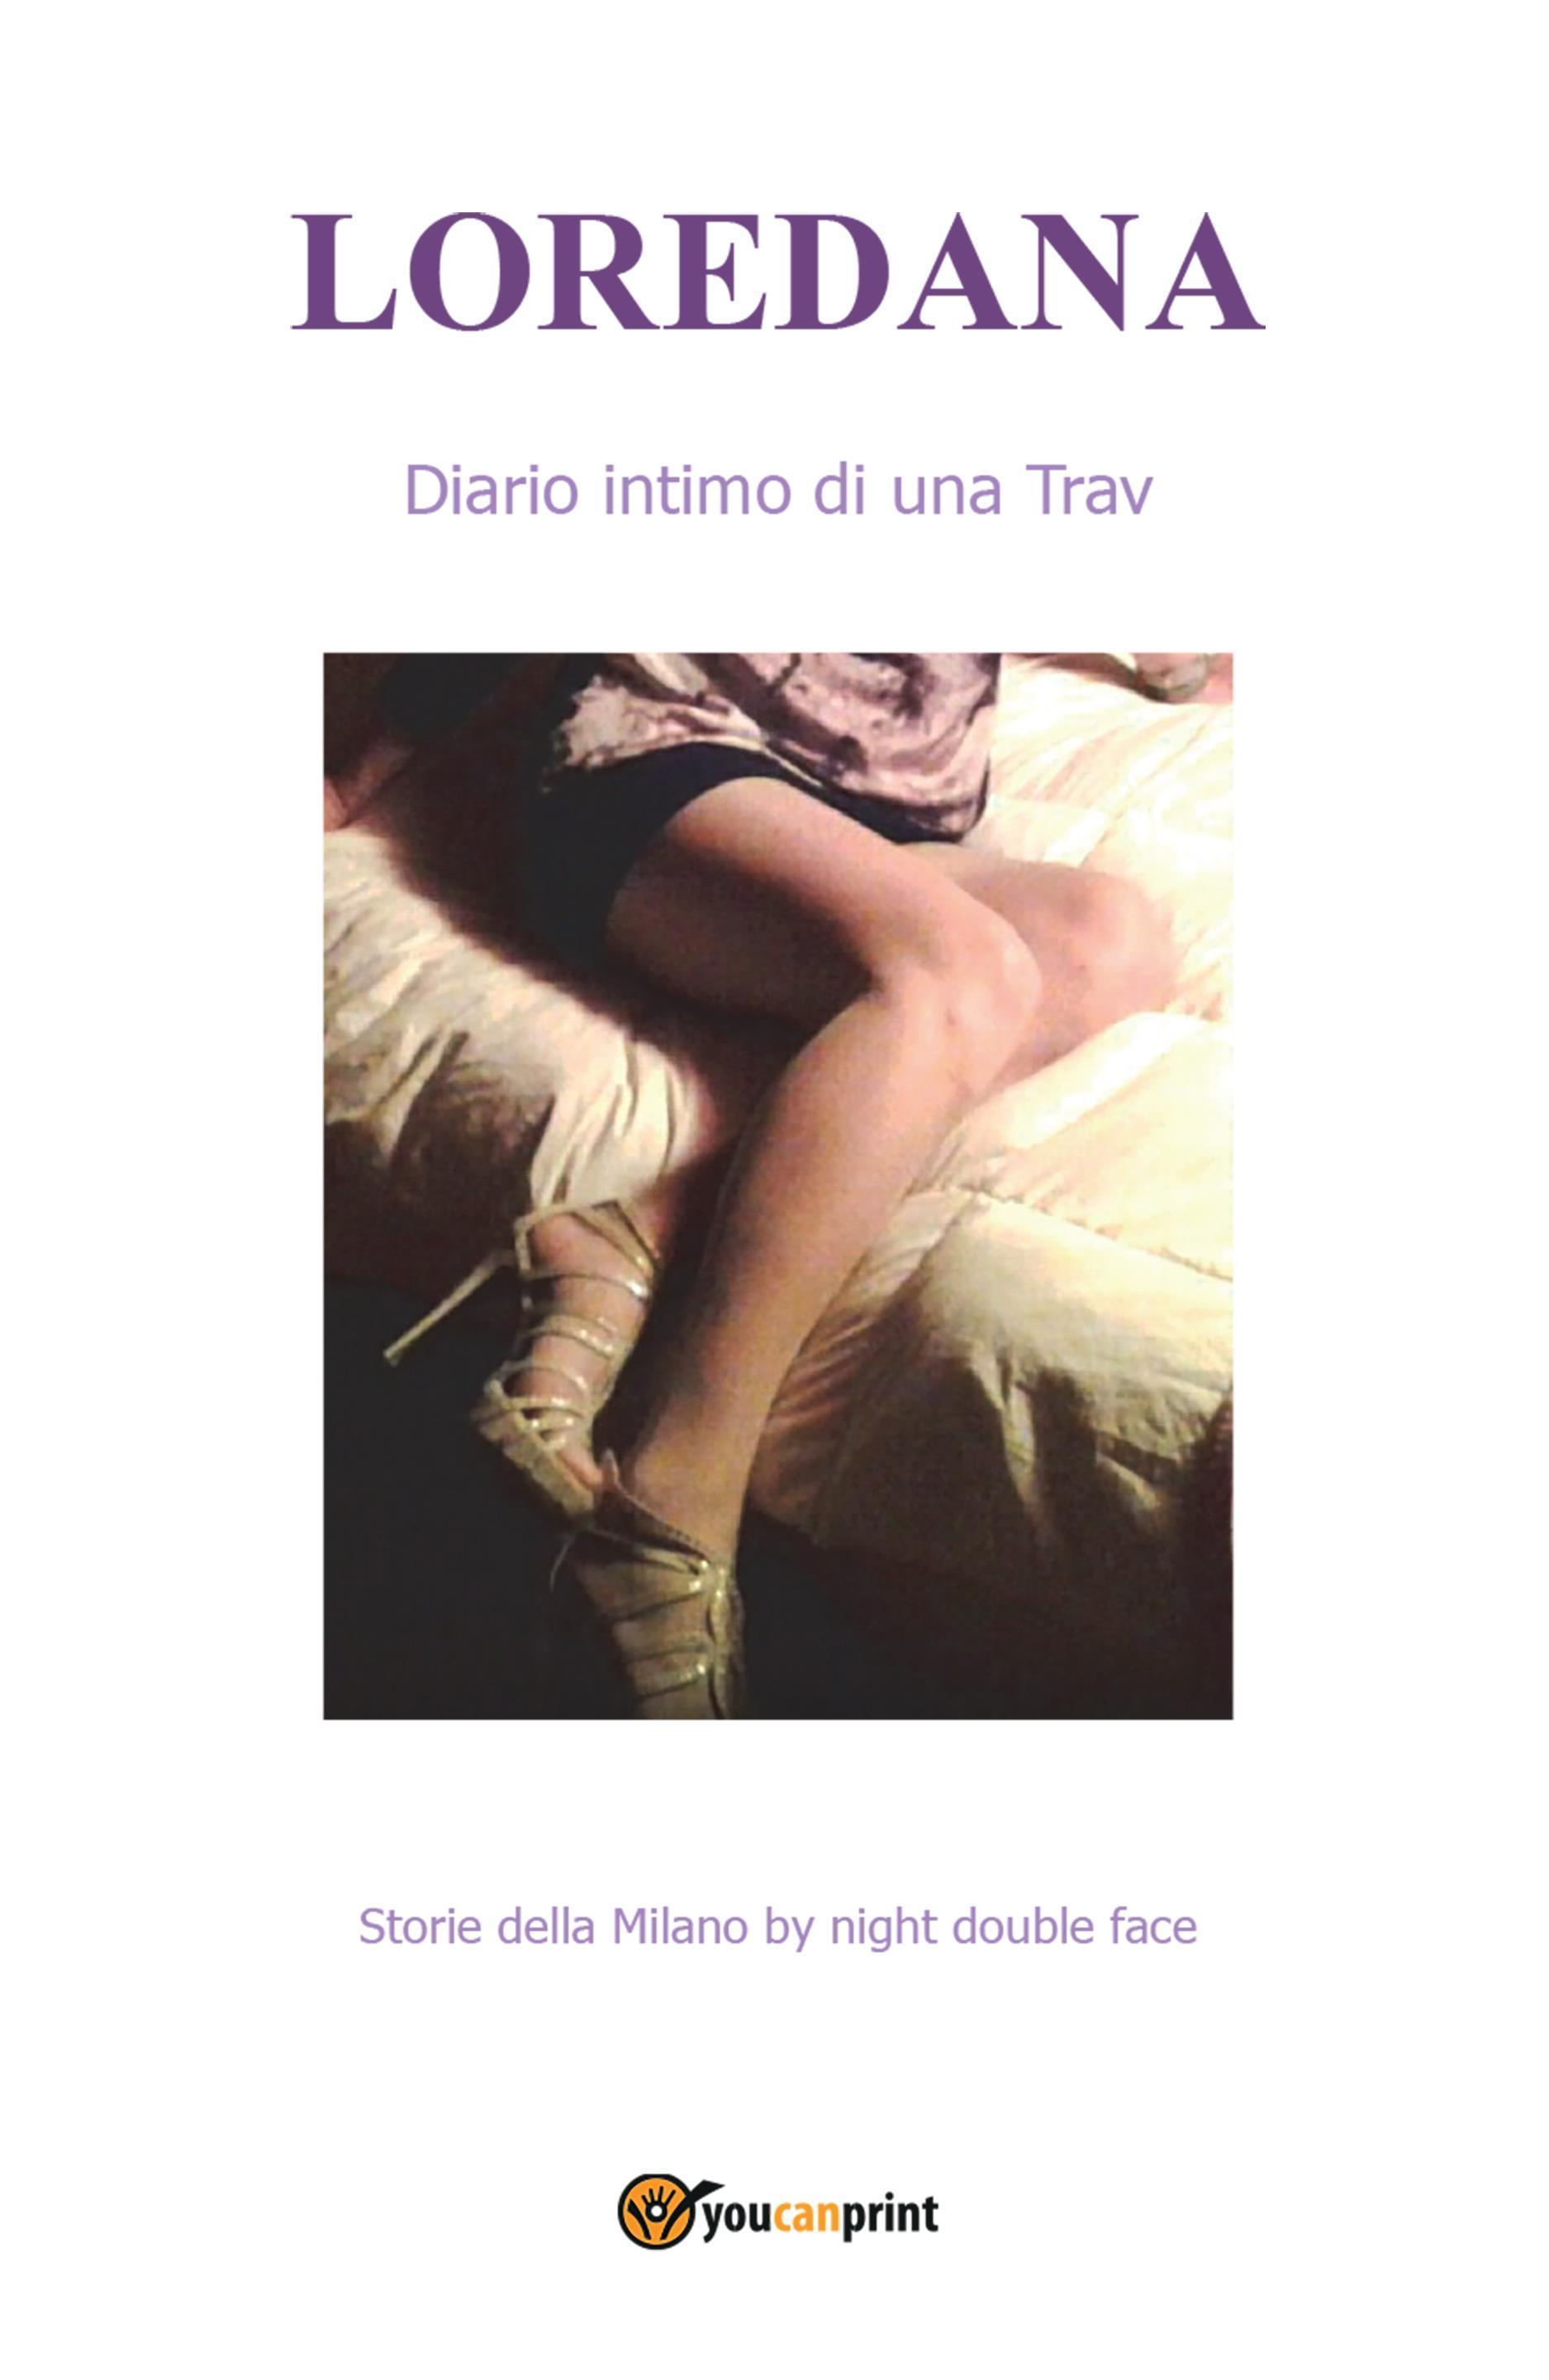 Loredana Diario intimo di una Trav